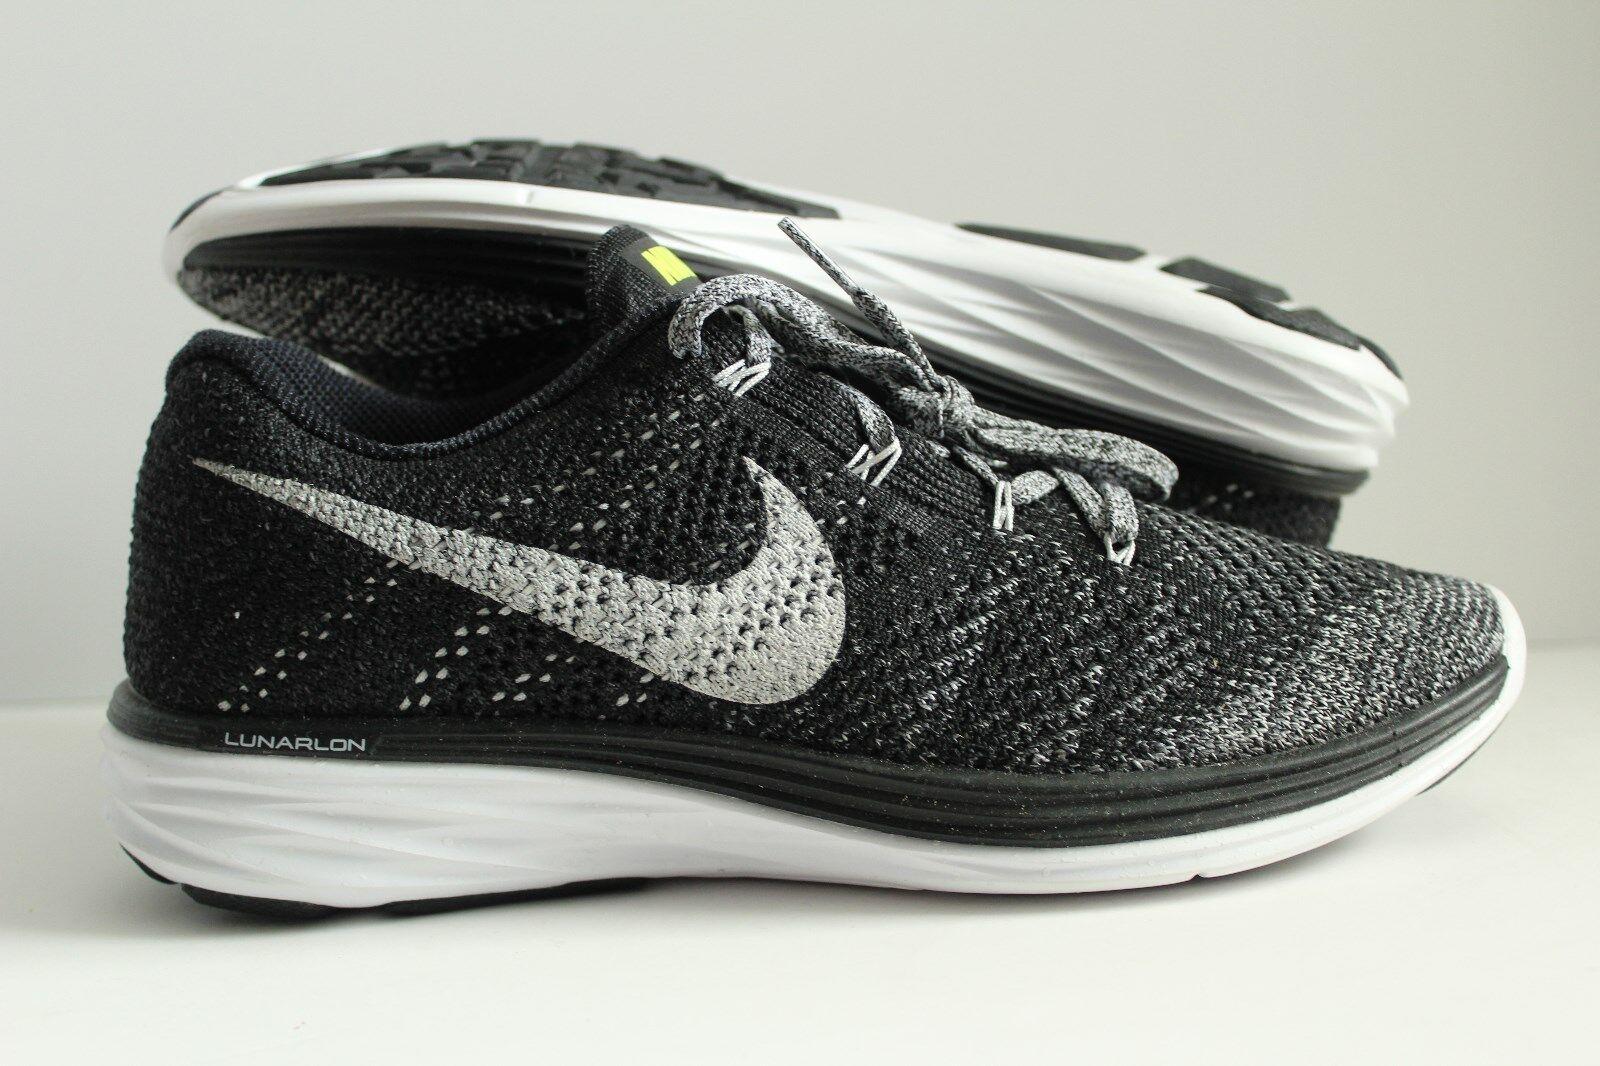 New Nike Men Free ID Flyknit Lunar Lunar Lunar shoes Black White Grey Size 8W 799276-001  ed2930